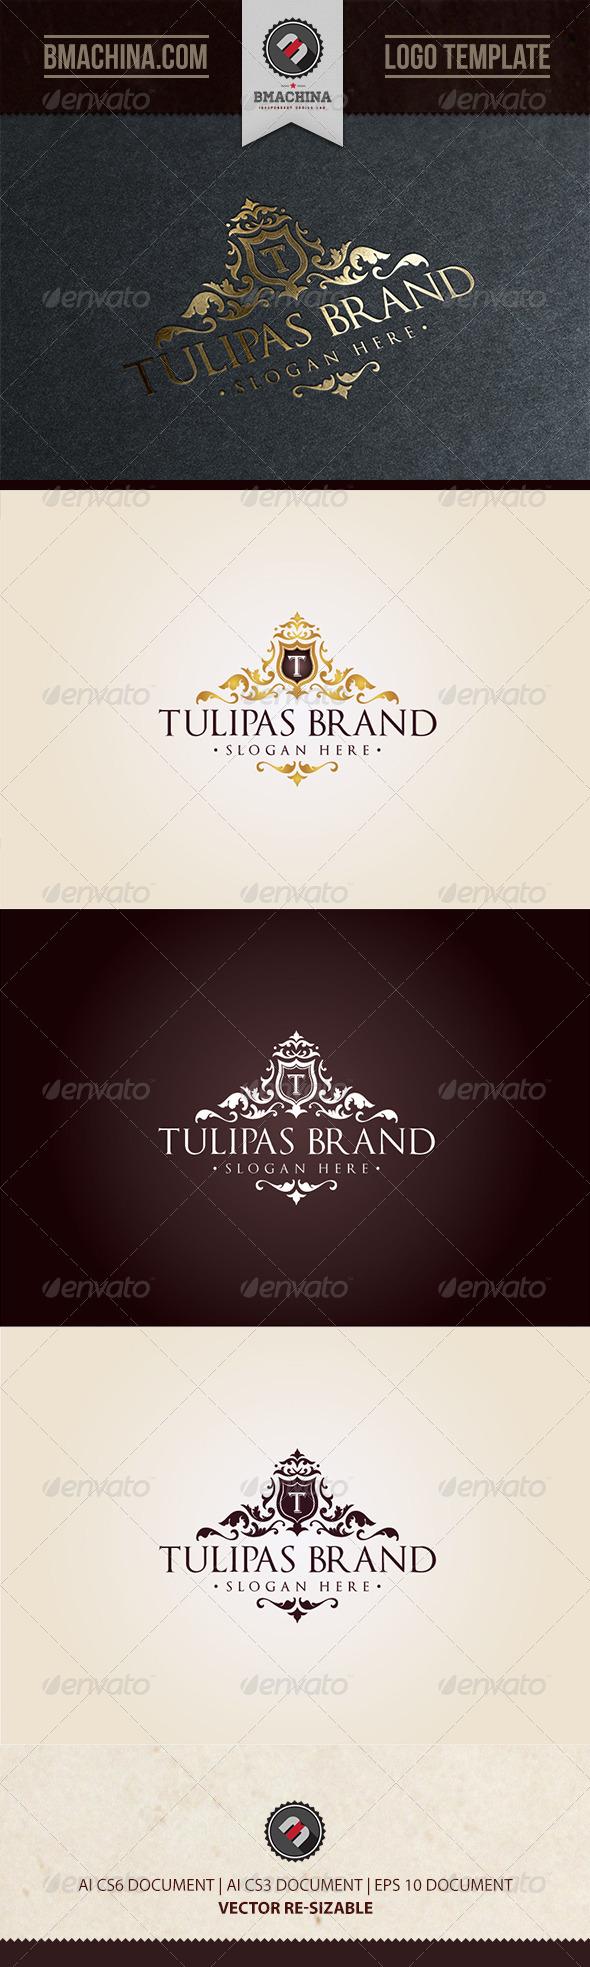 GraphicRiver Tulipas Brand Logo Template 8645360